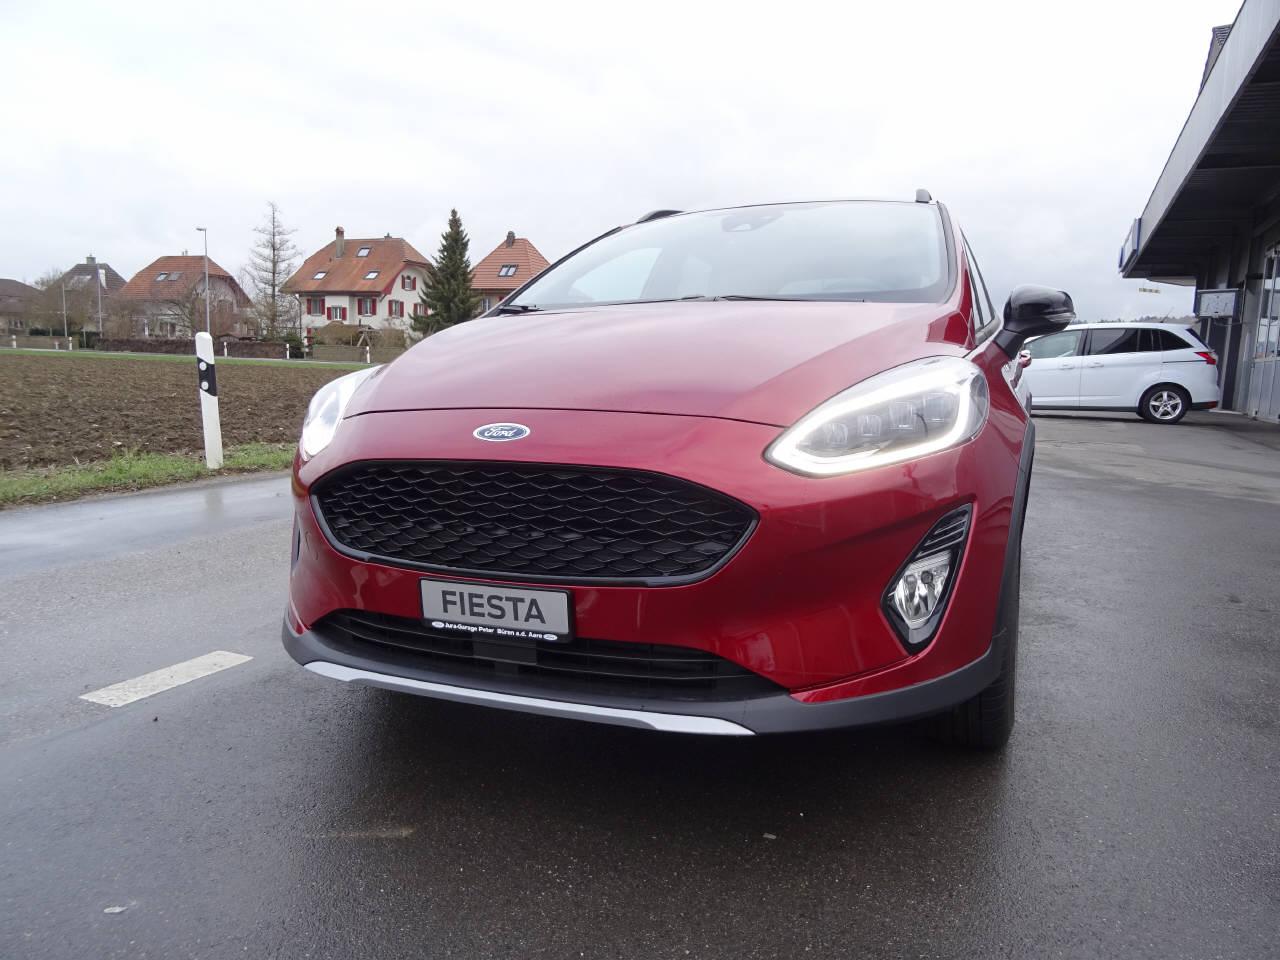 saloon Ford Fiesta 1.0 EcoB 140 Active 3